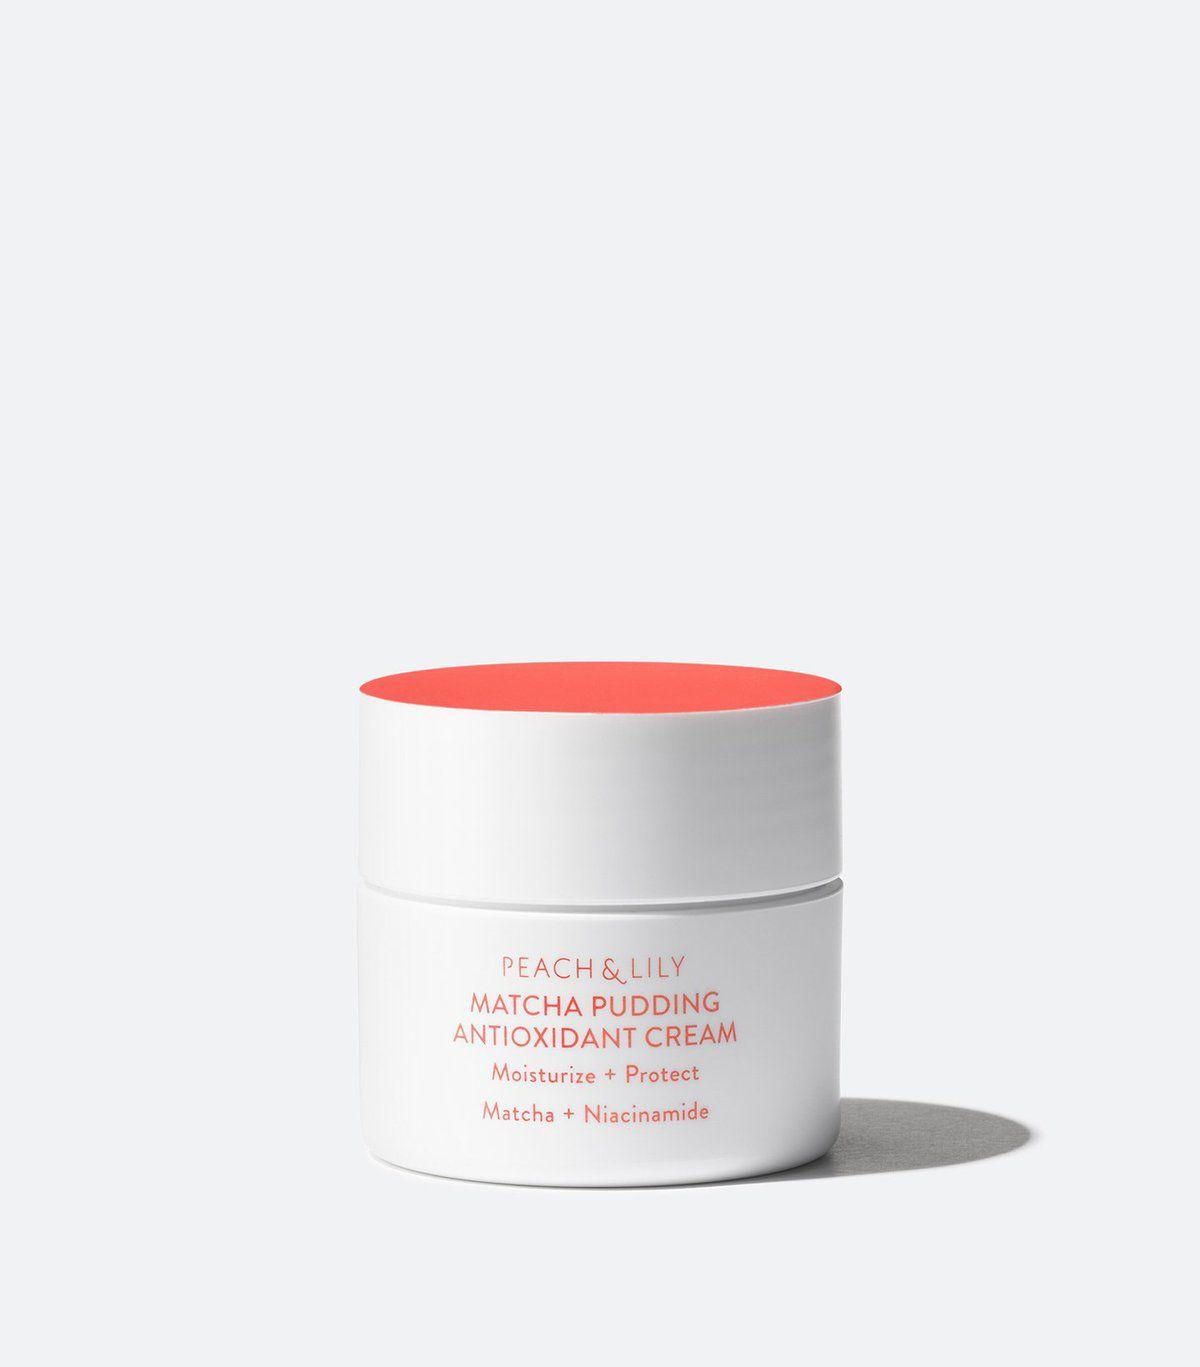 Peach and Lily Matcha Pudding Antioxidant Cream